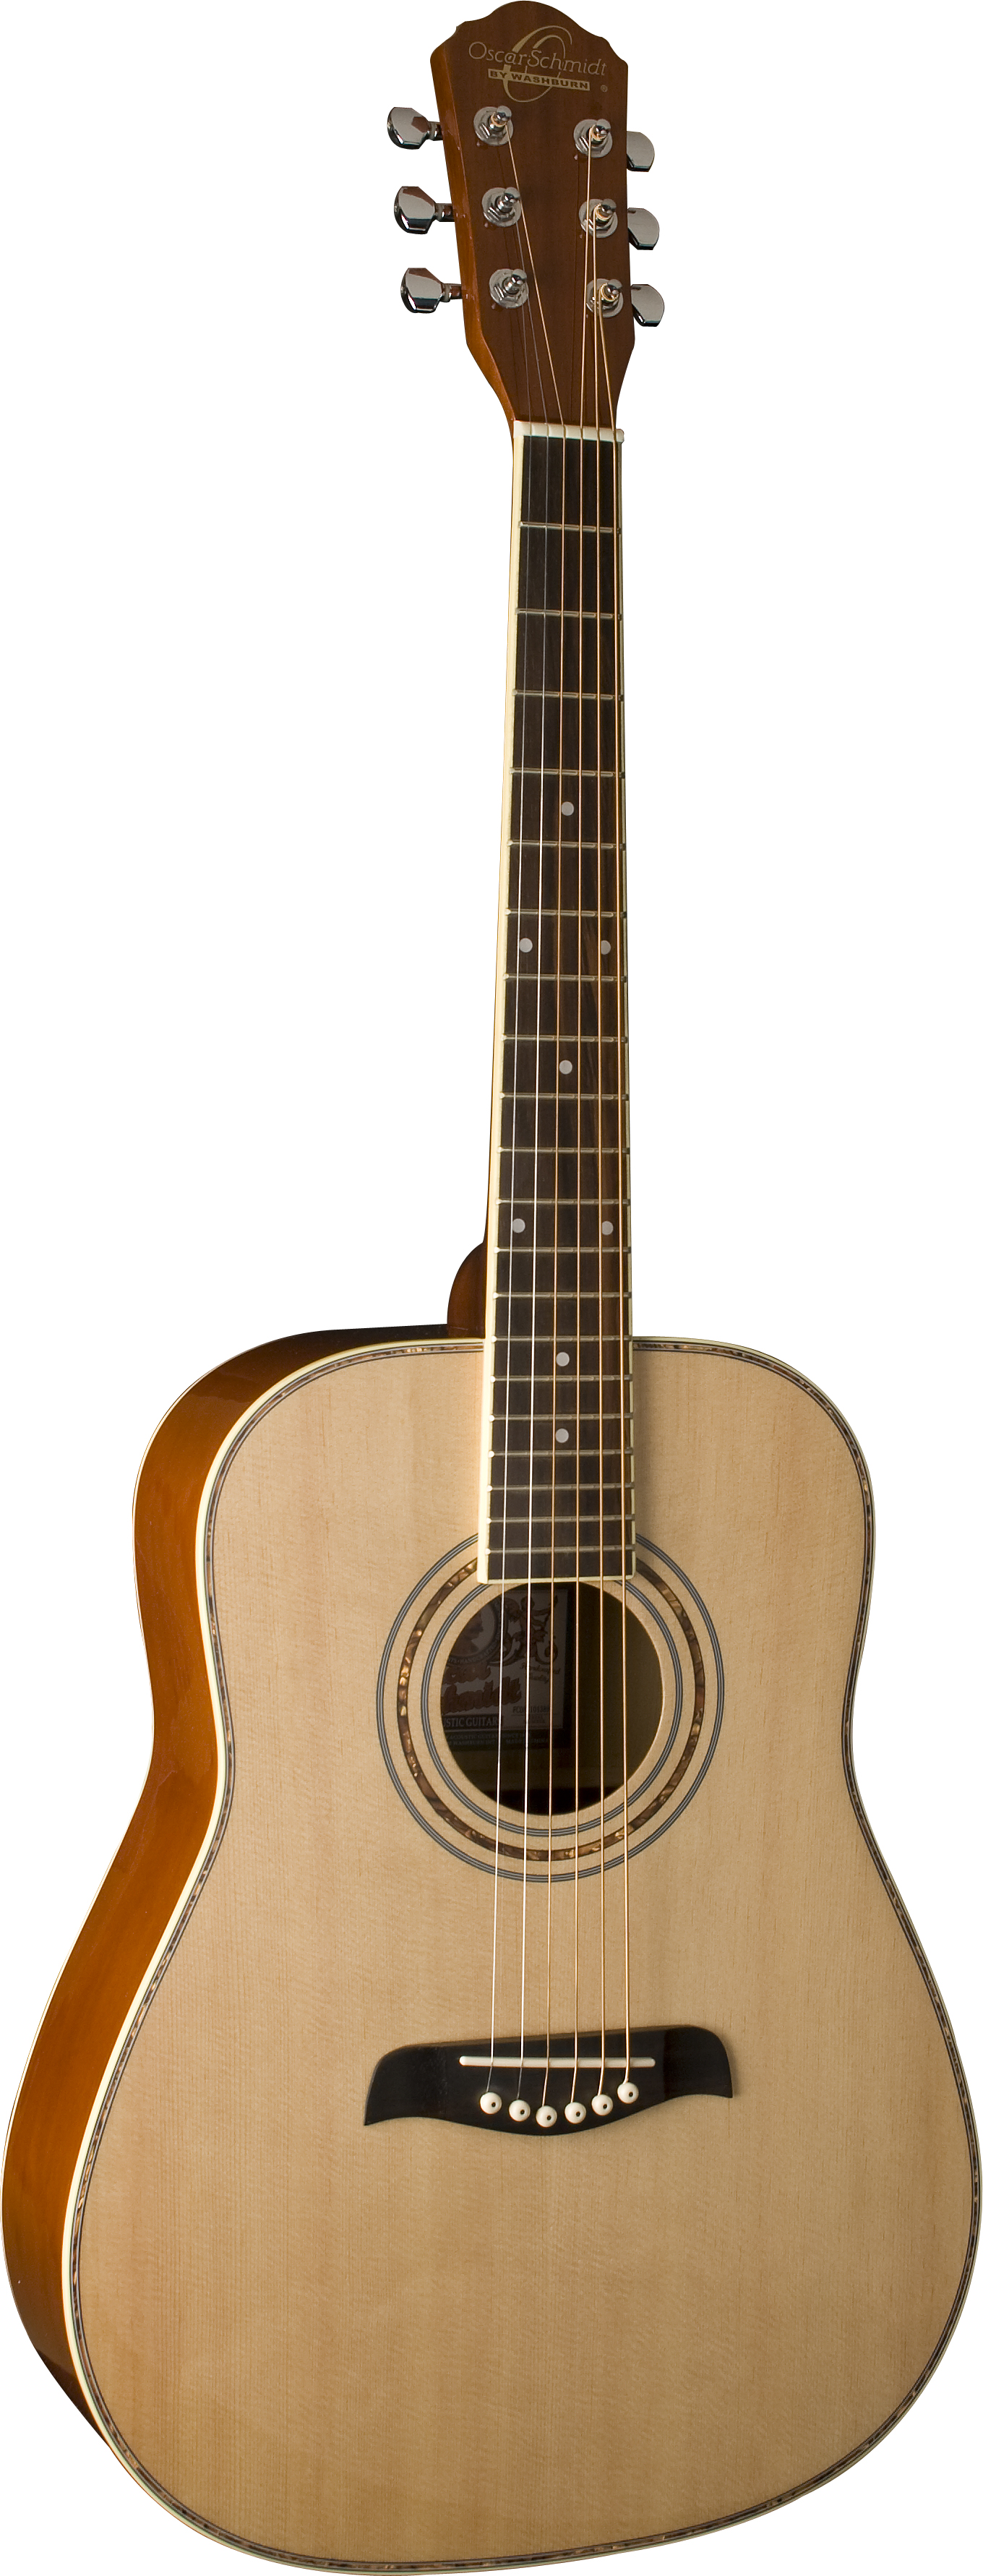 Oscar Schmidt OG1LH Natural Lefty 3 4 Size Dreadnought Guitar. Left hand by KMC Music